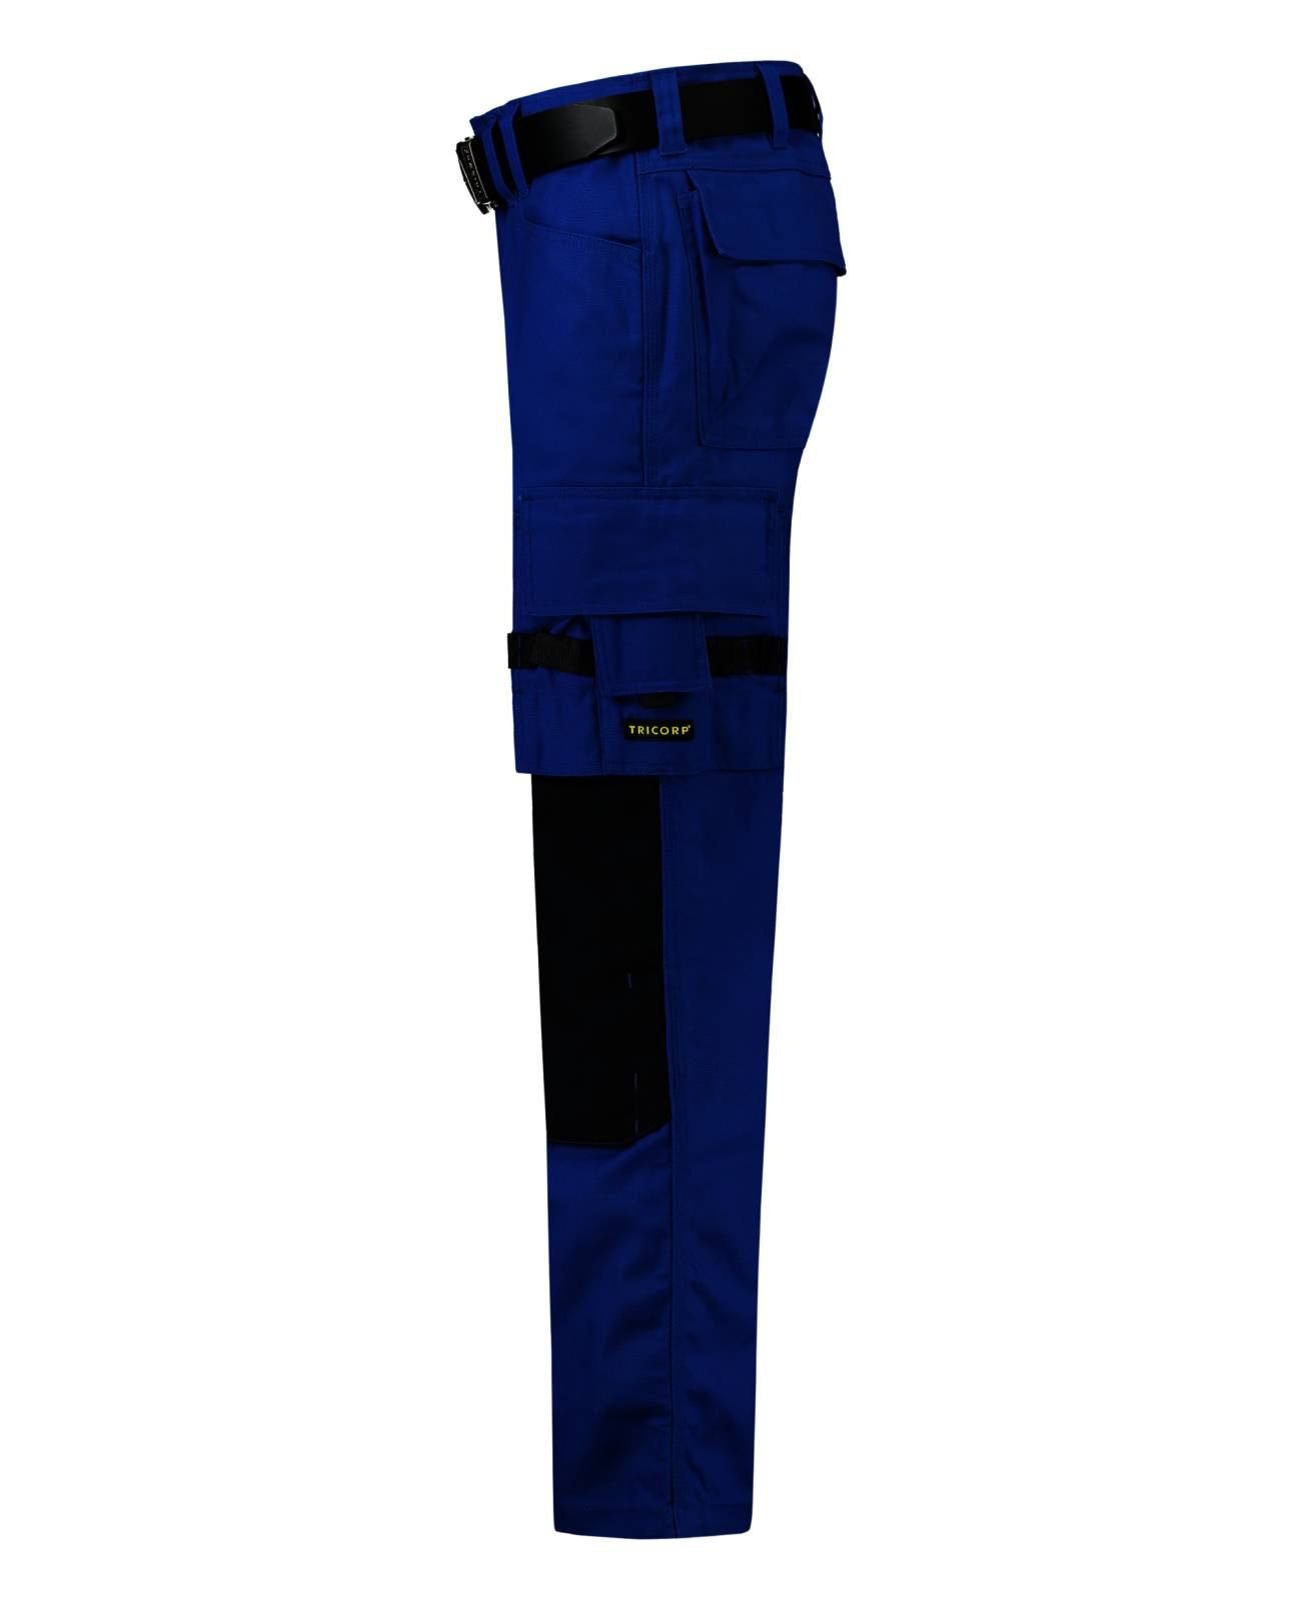 Tricorp Workwear Broeken 502009-TWC2000 koningsblauw-marineblauw(Royalnavy)